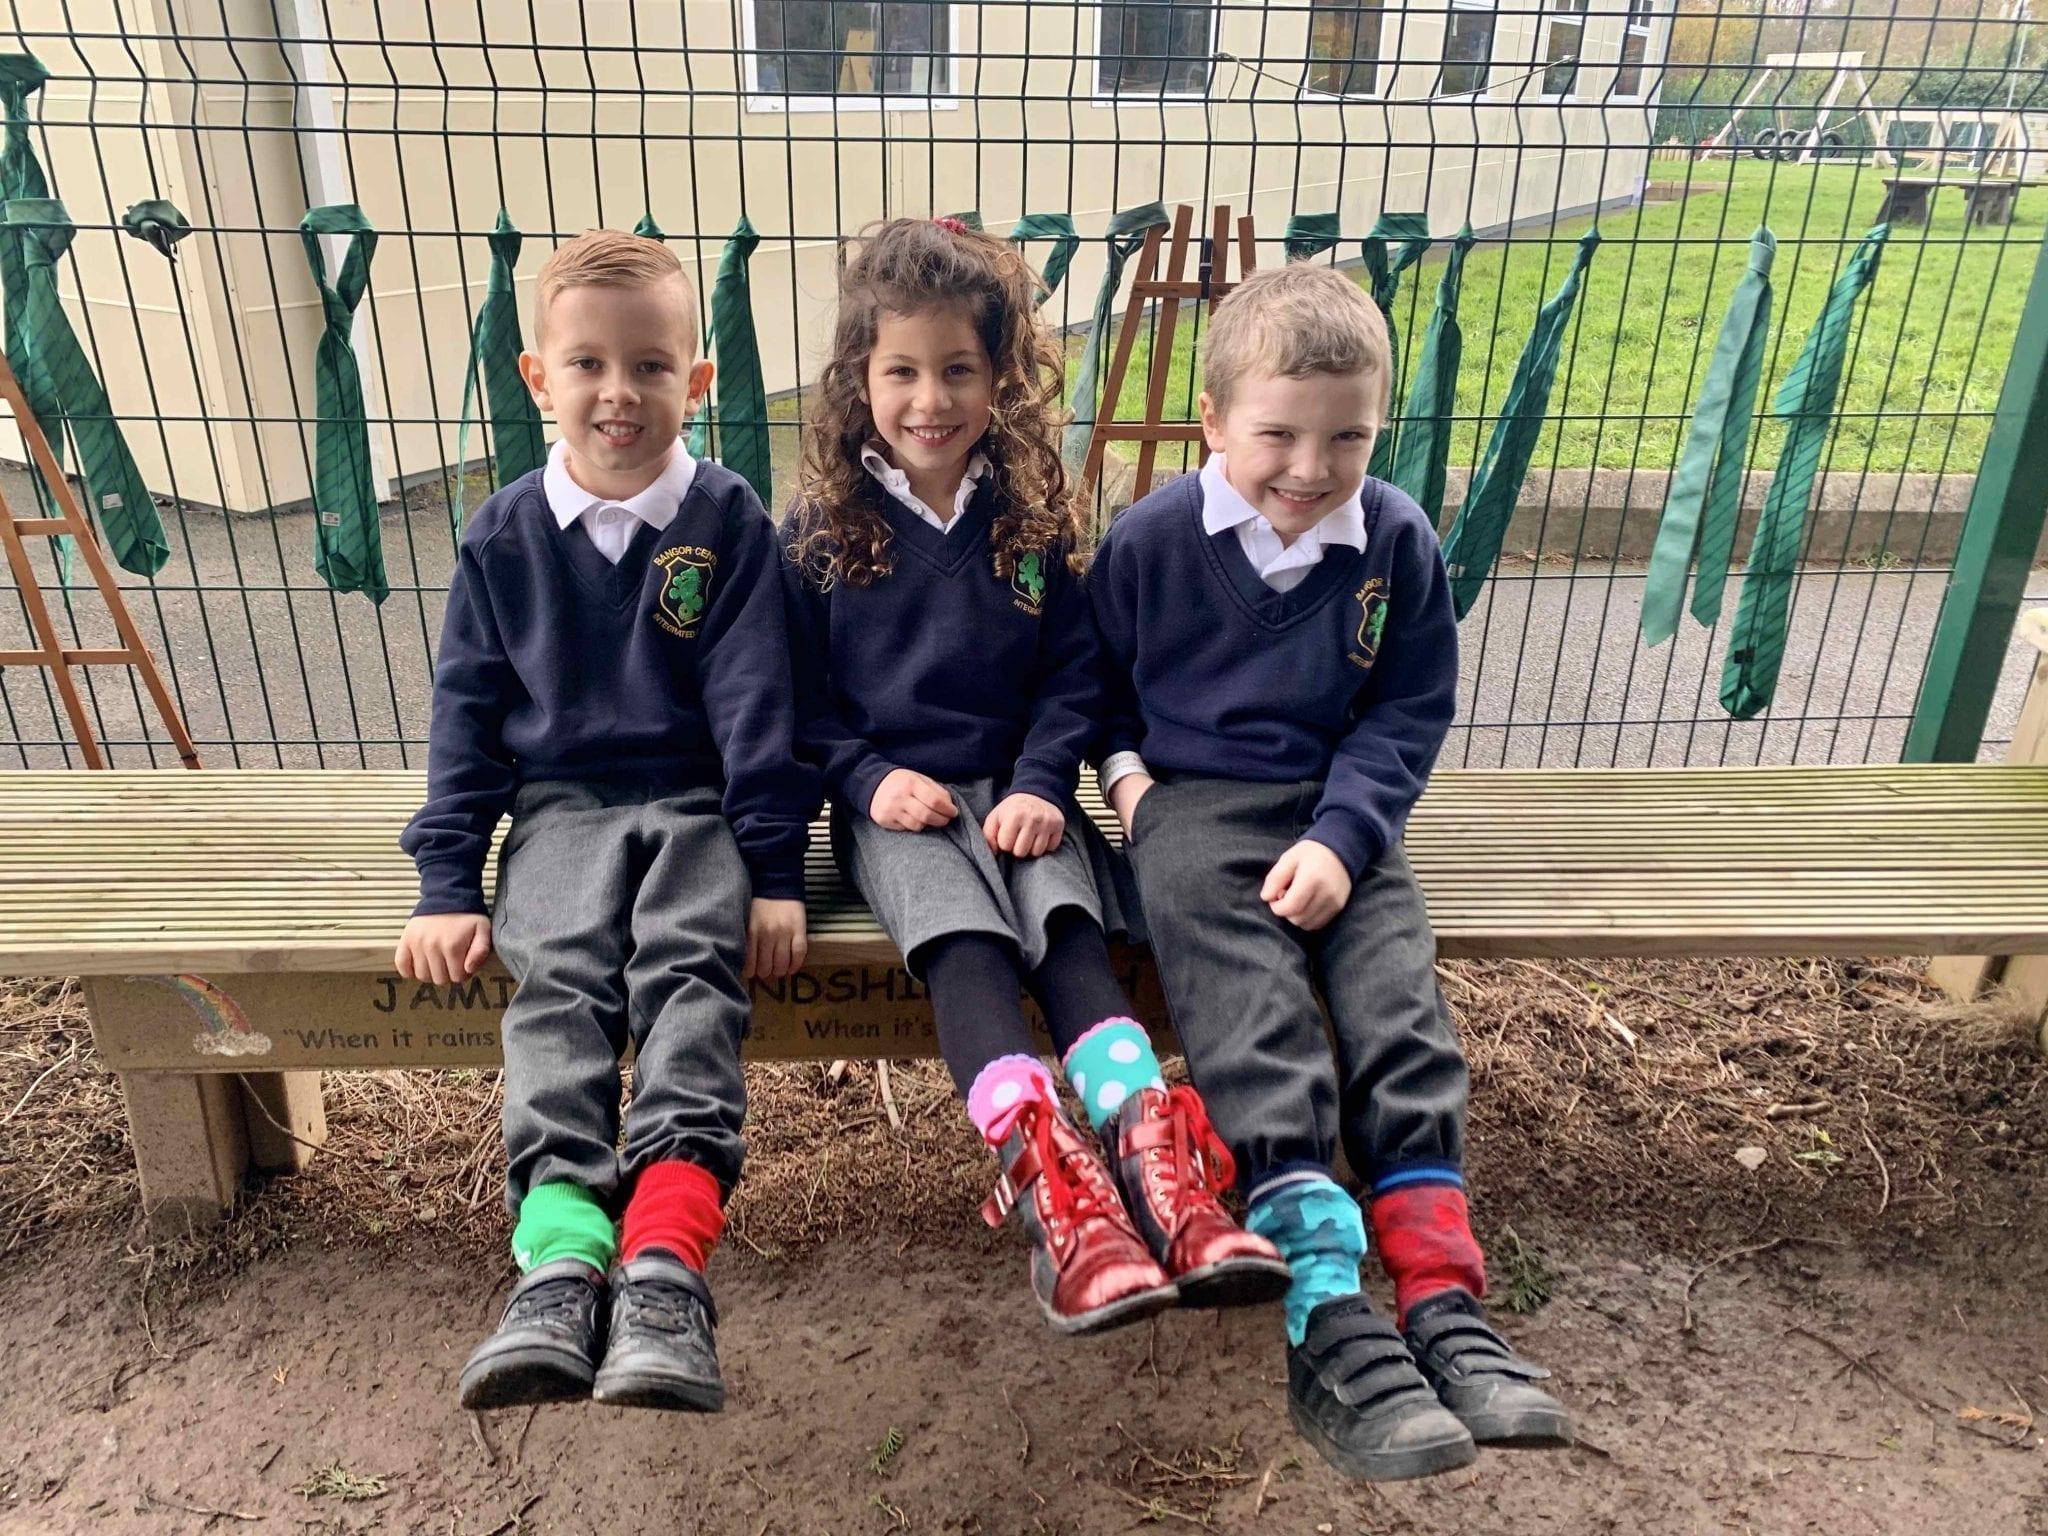 Bangor schools embrace odd sock day